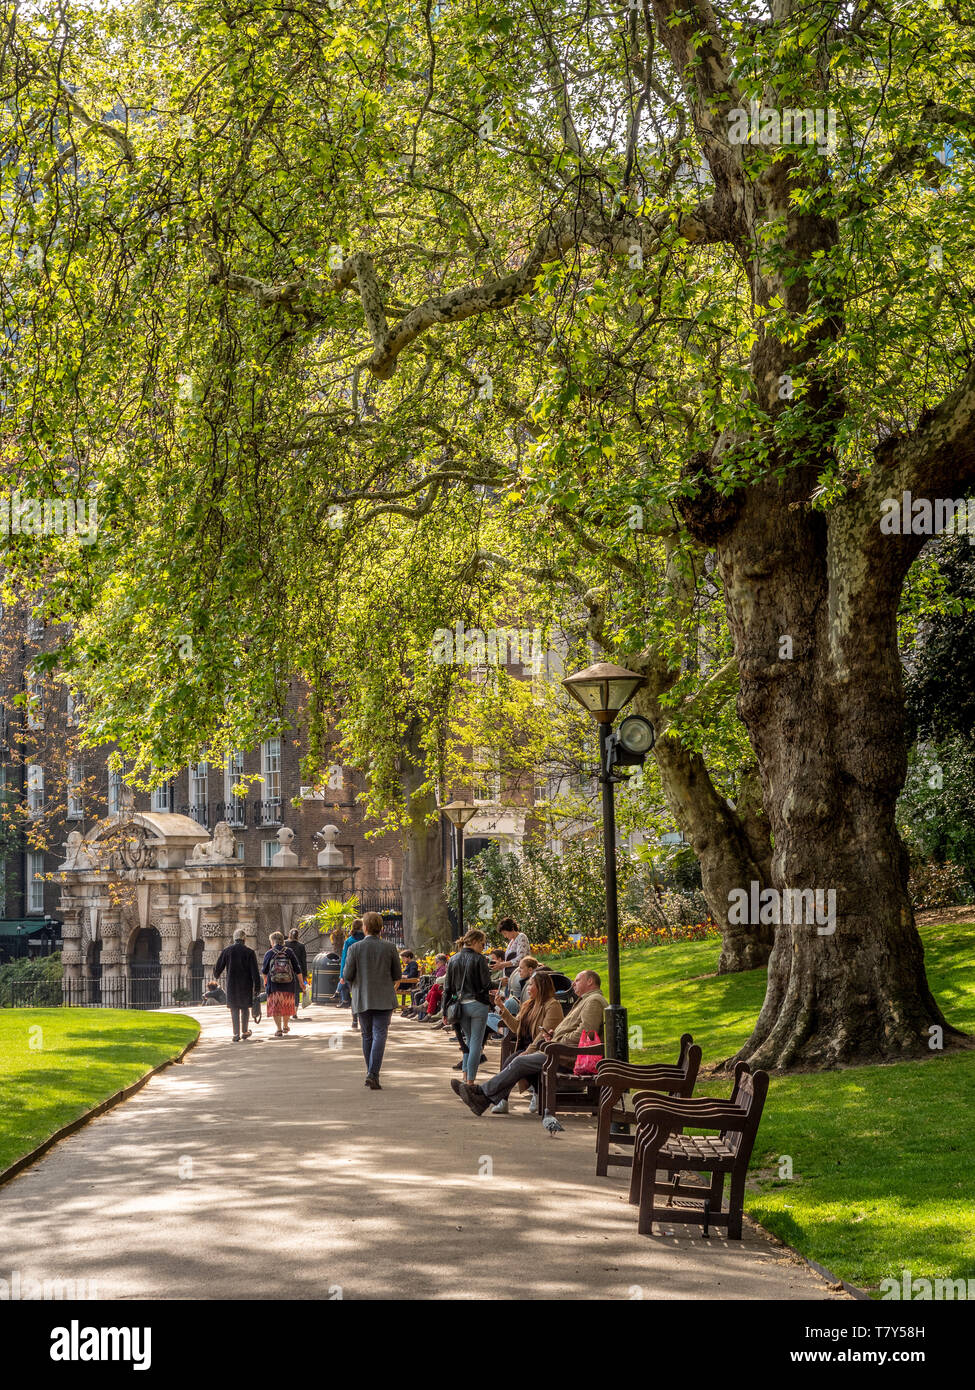 Victoria Embankment Gardens, London, UK. - Stock Image